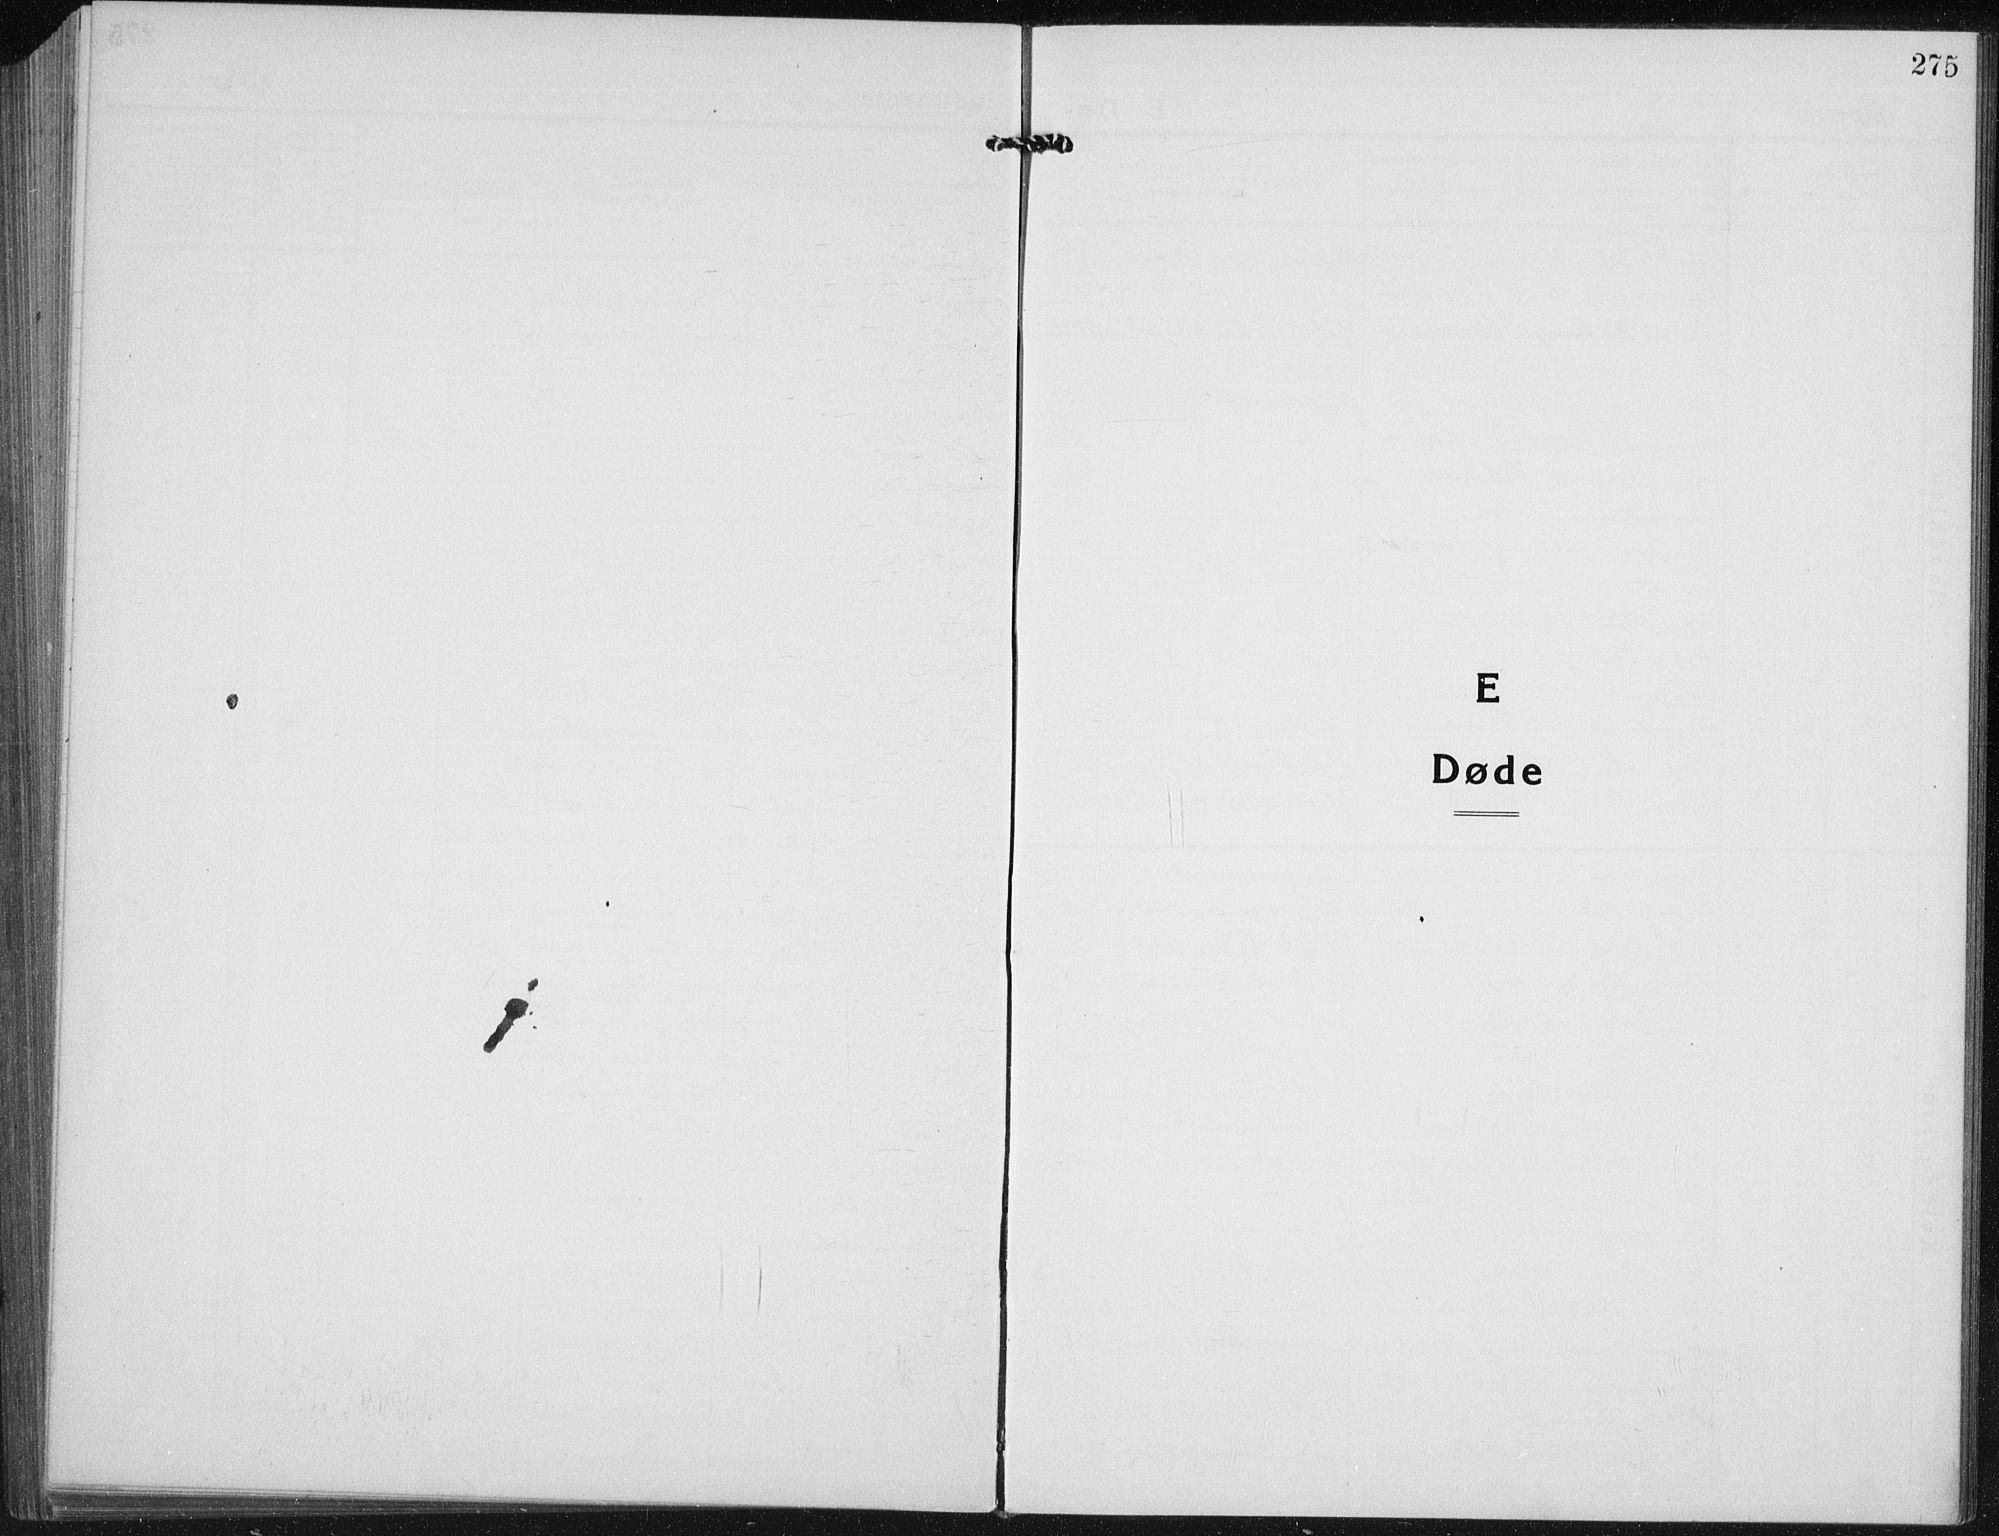 SAH, Vardal prestekontor, H/Ha/Hab/L0017: Klokkerbok nr. 17, 1922-1941, s. 275